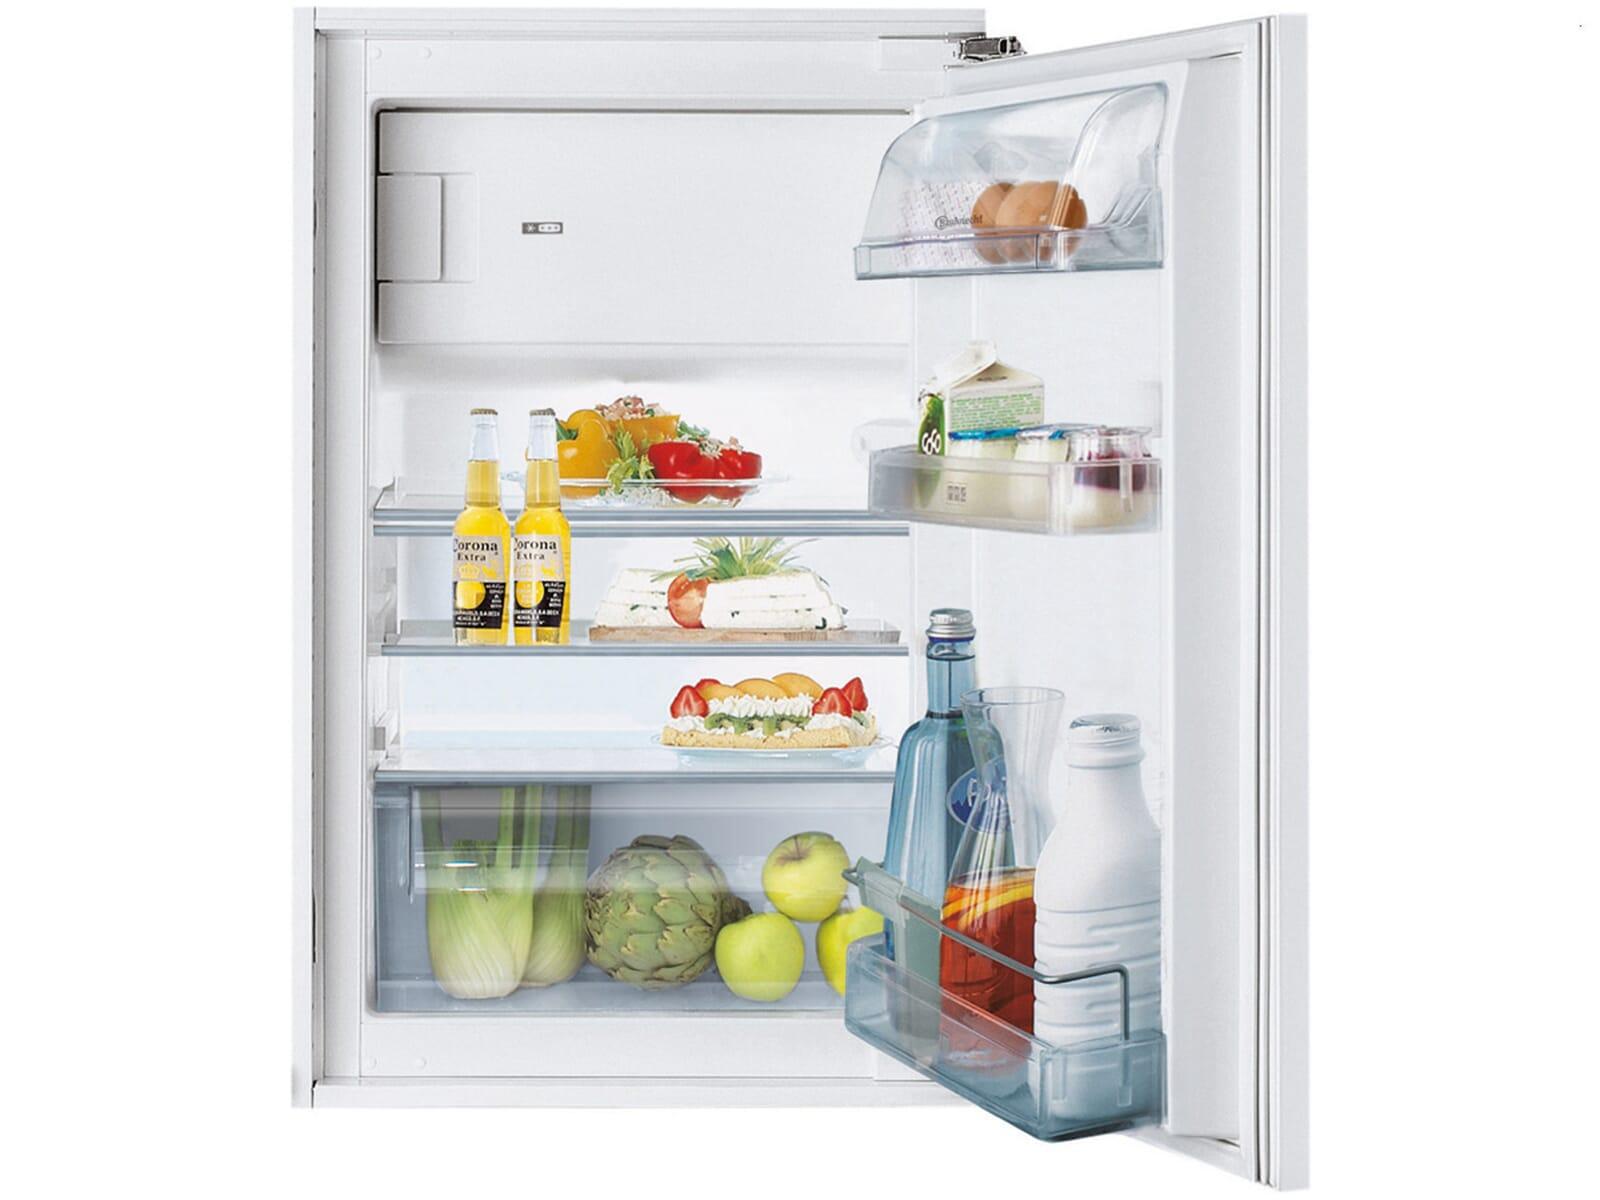 Produktabbildung Bauknecht KVIE 4884 A+++ Einbau Kühlschrank